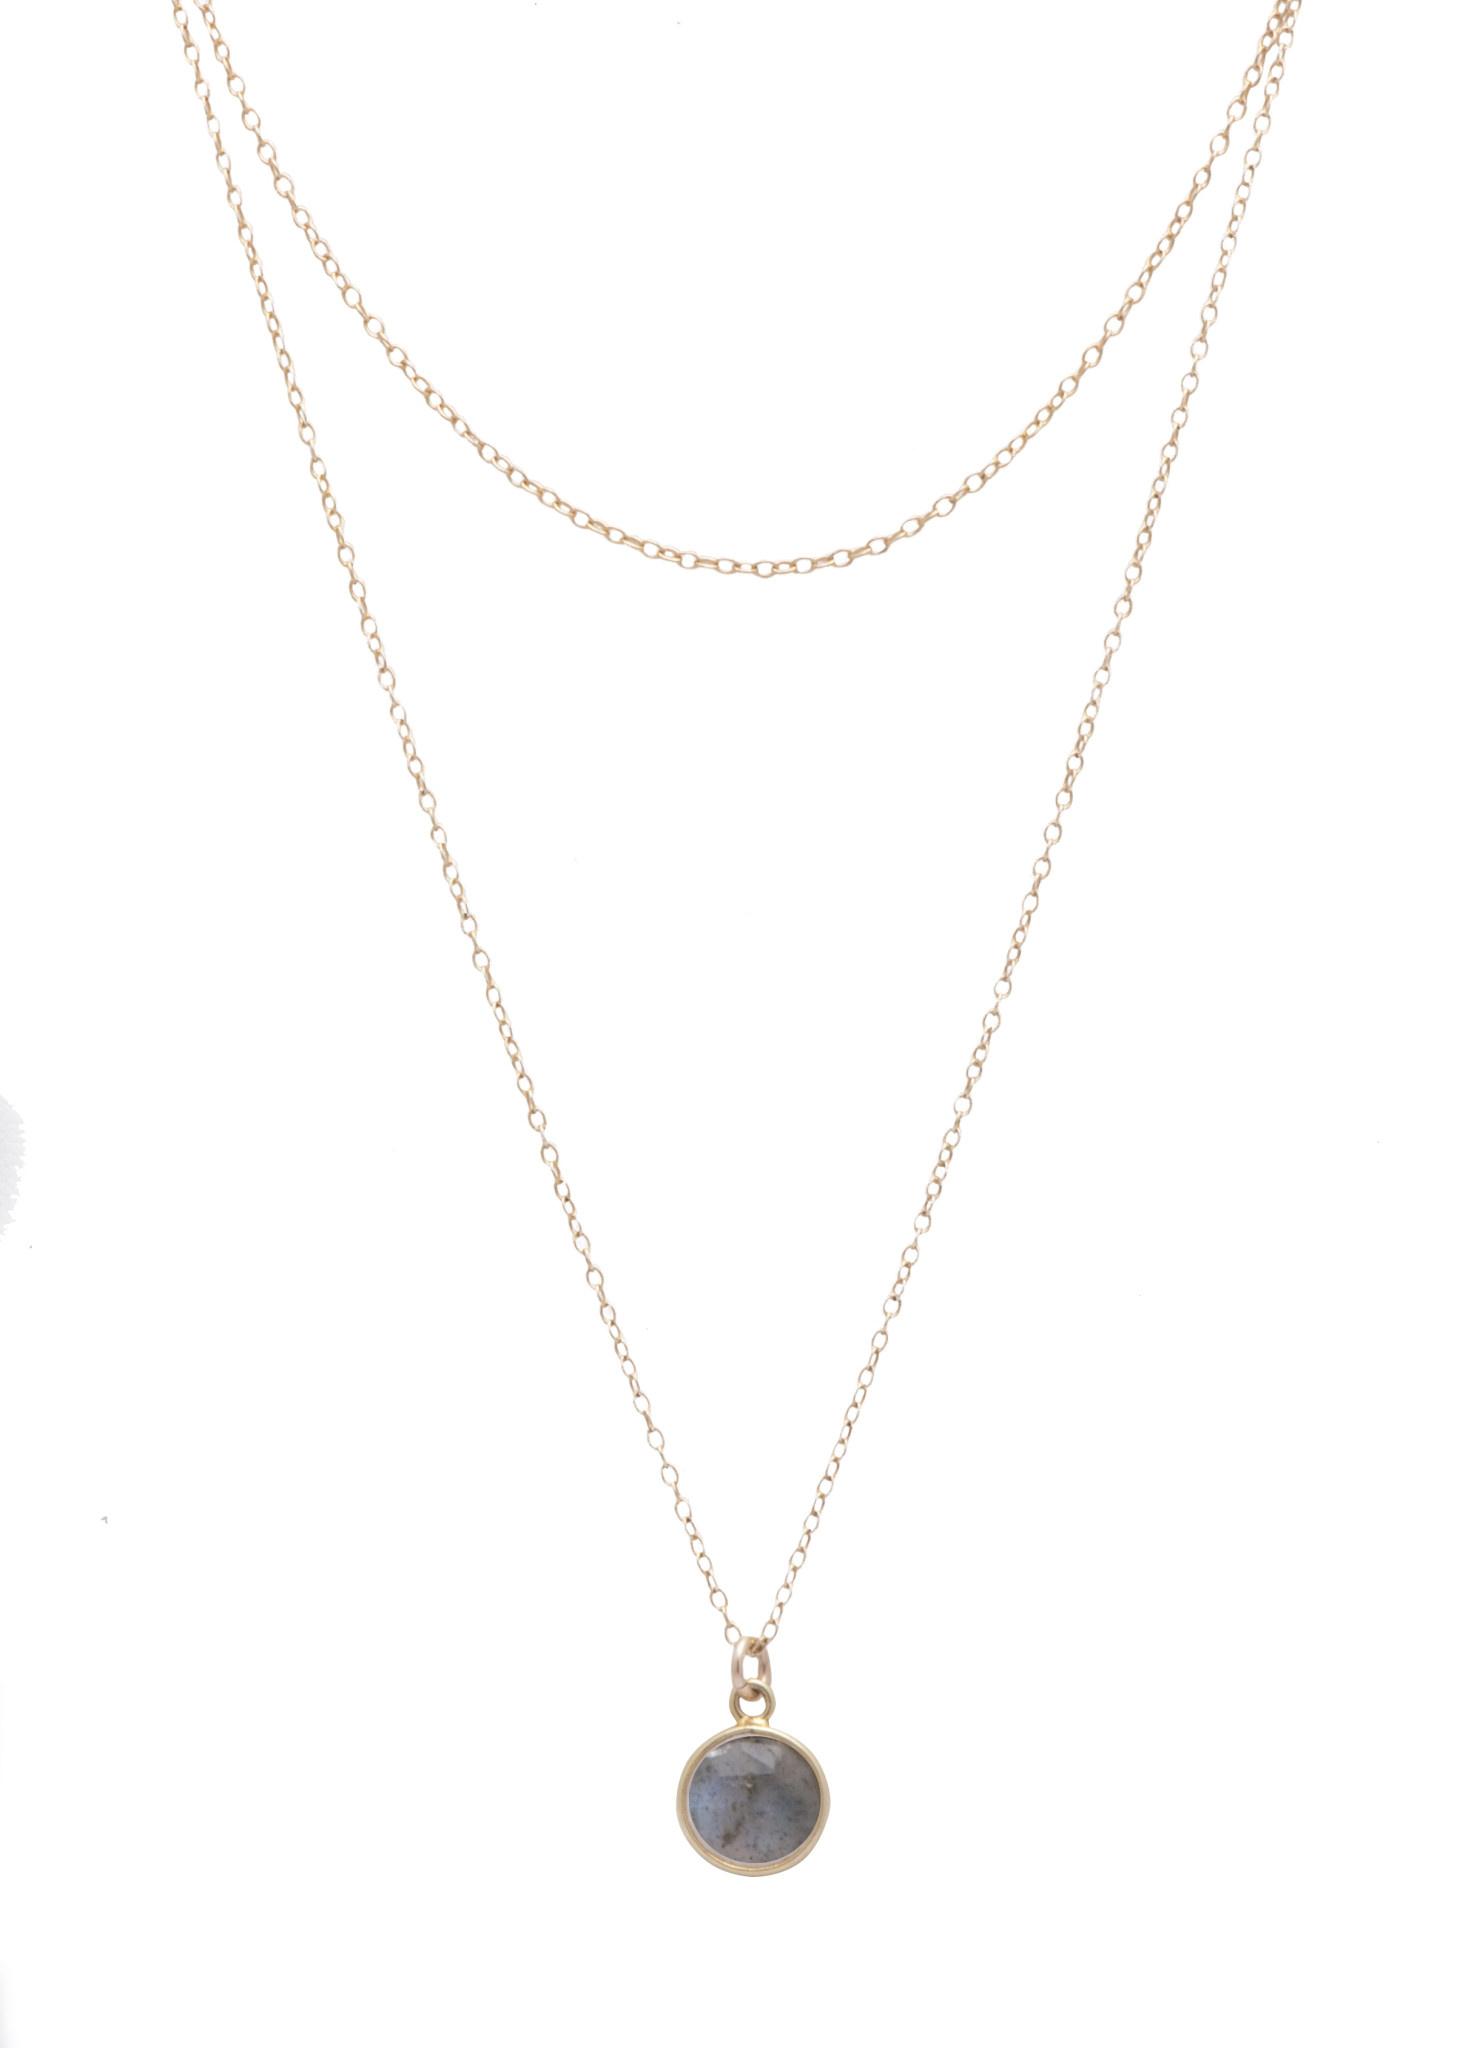 Sarah Mulder Jewelry Sarah Mulder Jewelry - Faye Necklace